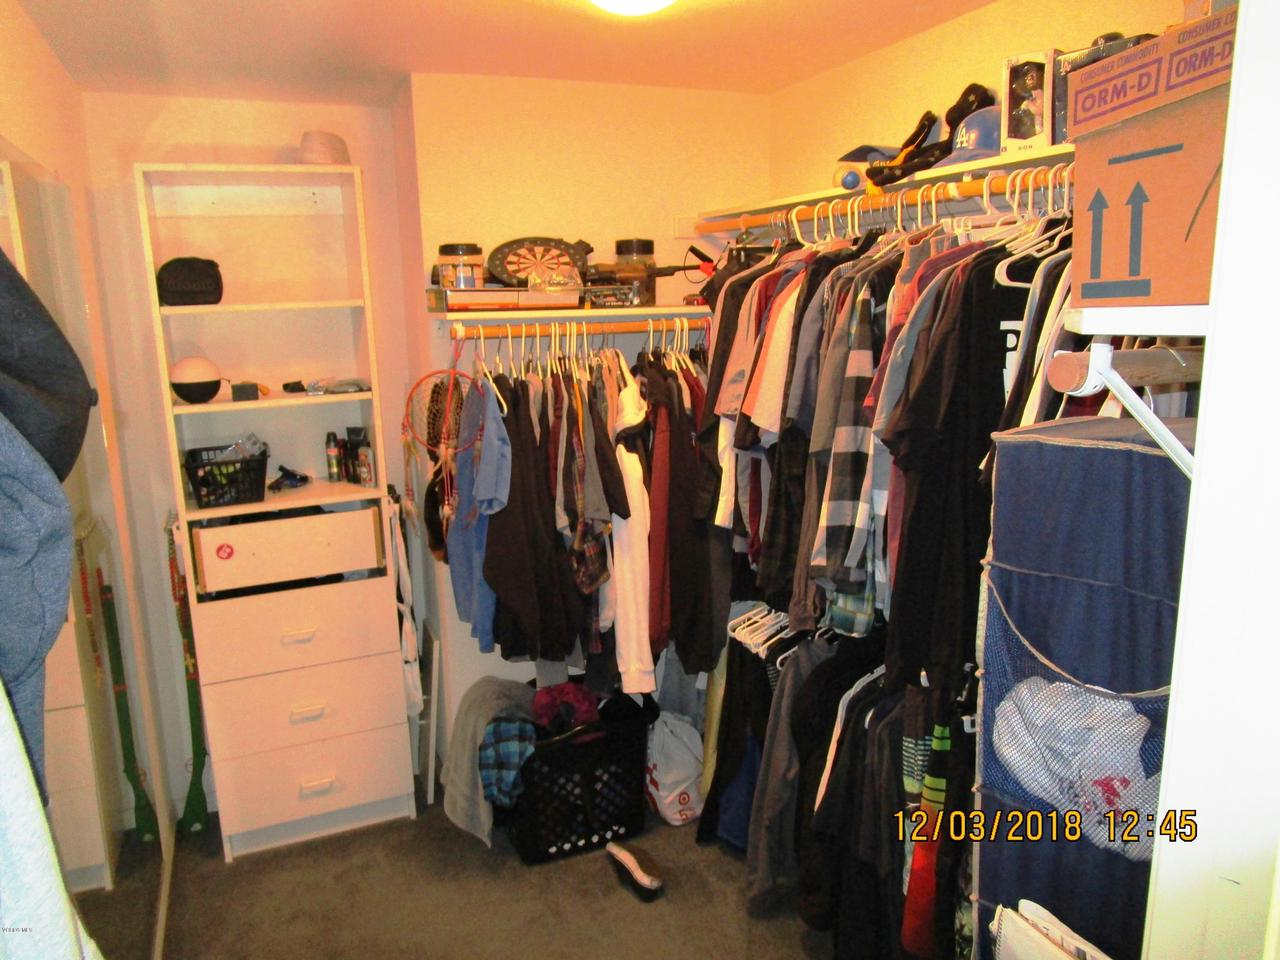 1063 MEADOWLARK, Fillmore, CA 93015 - bed 4 closet